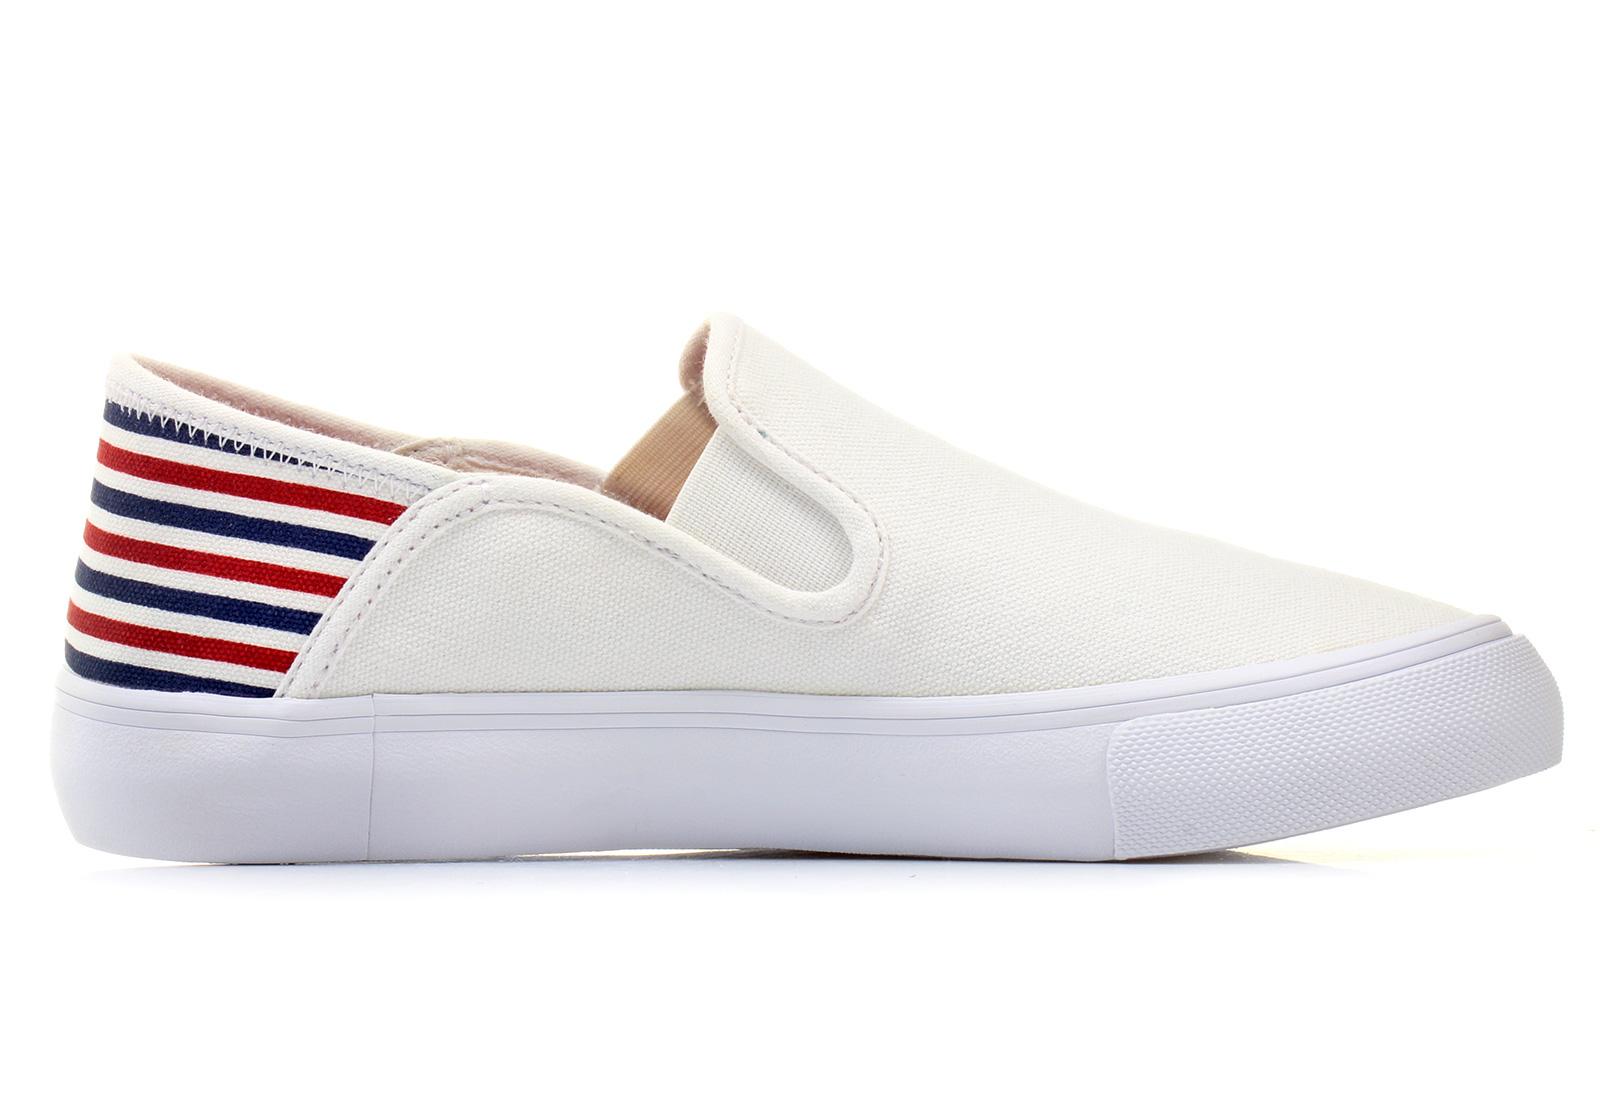 78acb9b498 Lacoste Cipő - Bellevue Slip - 141spj1004-286 - Office Shoes ...